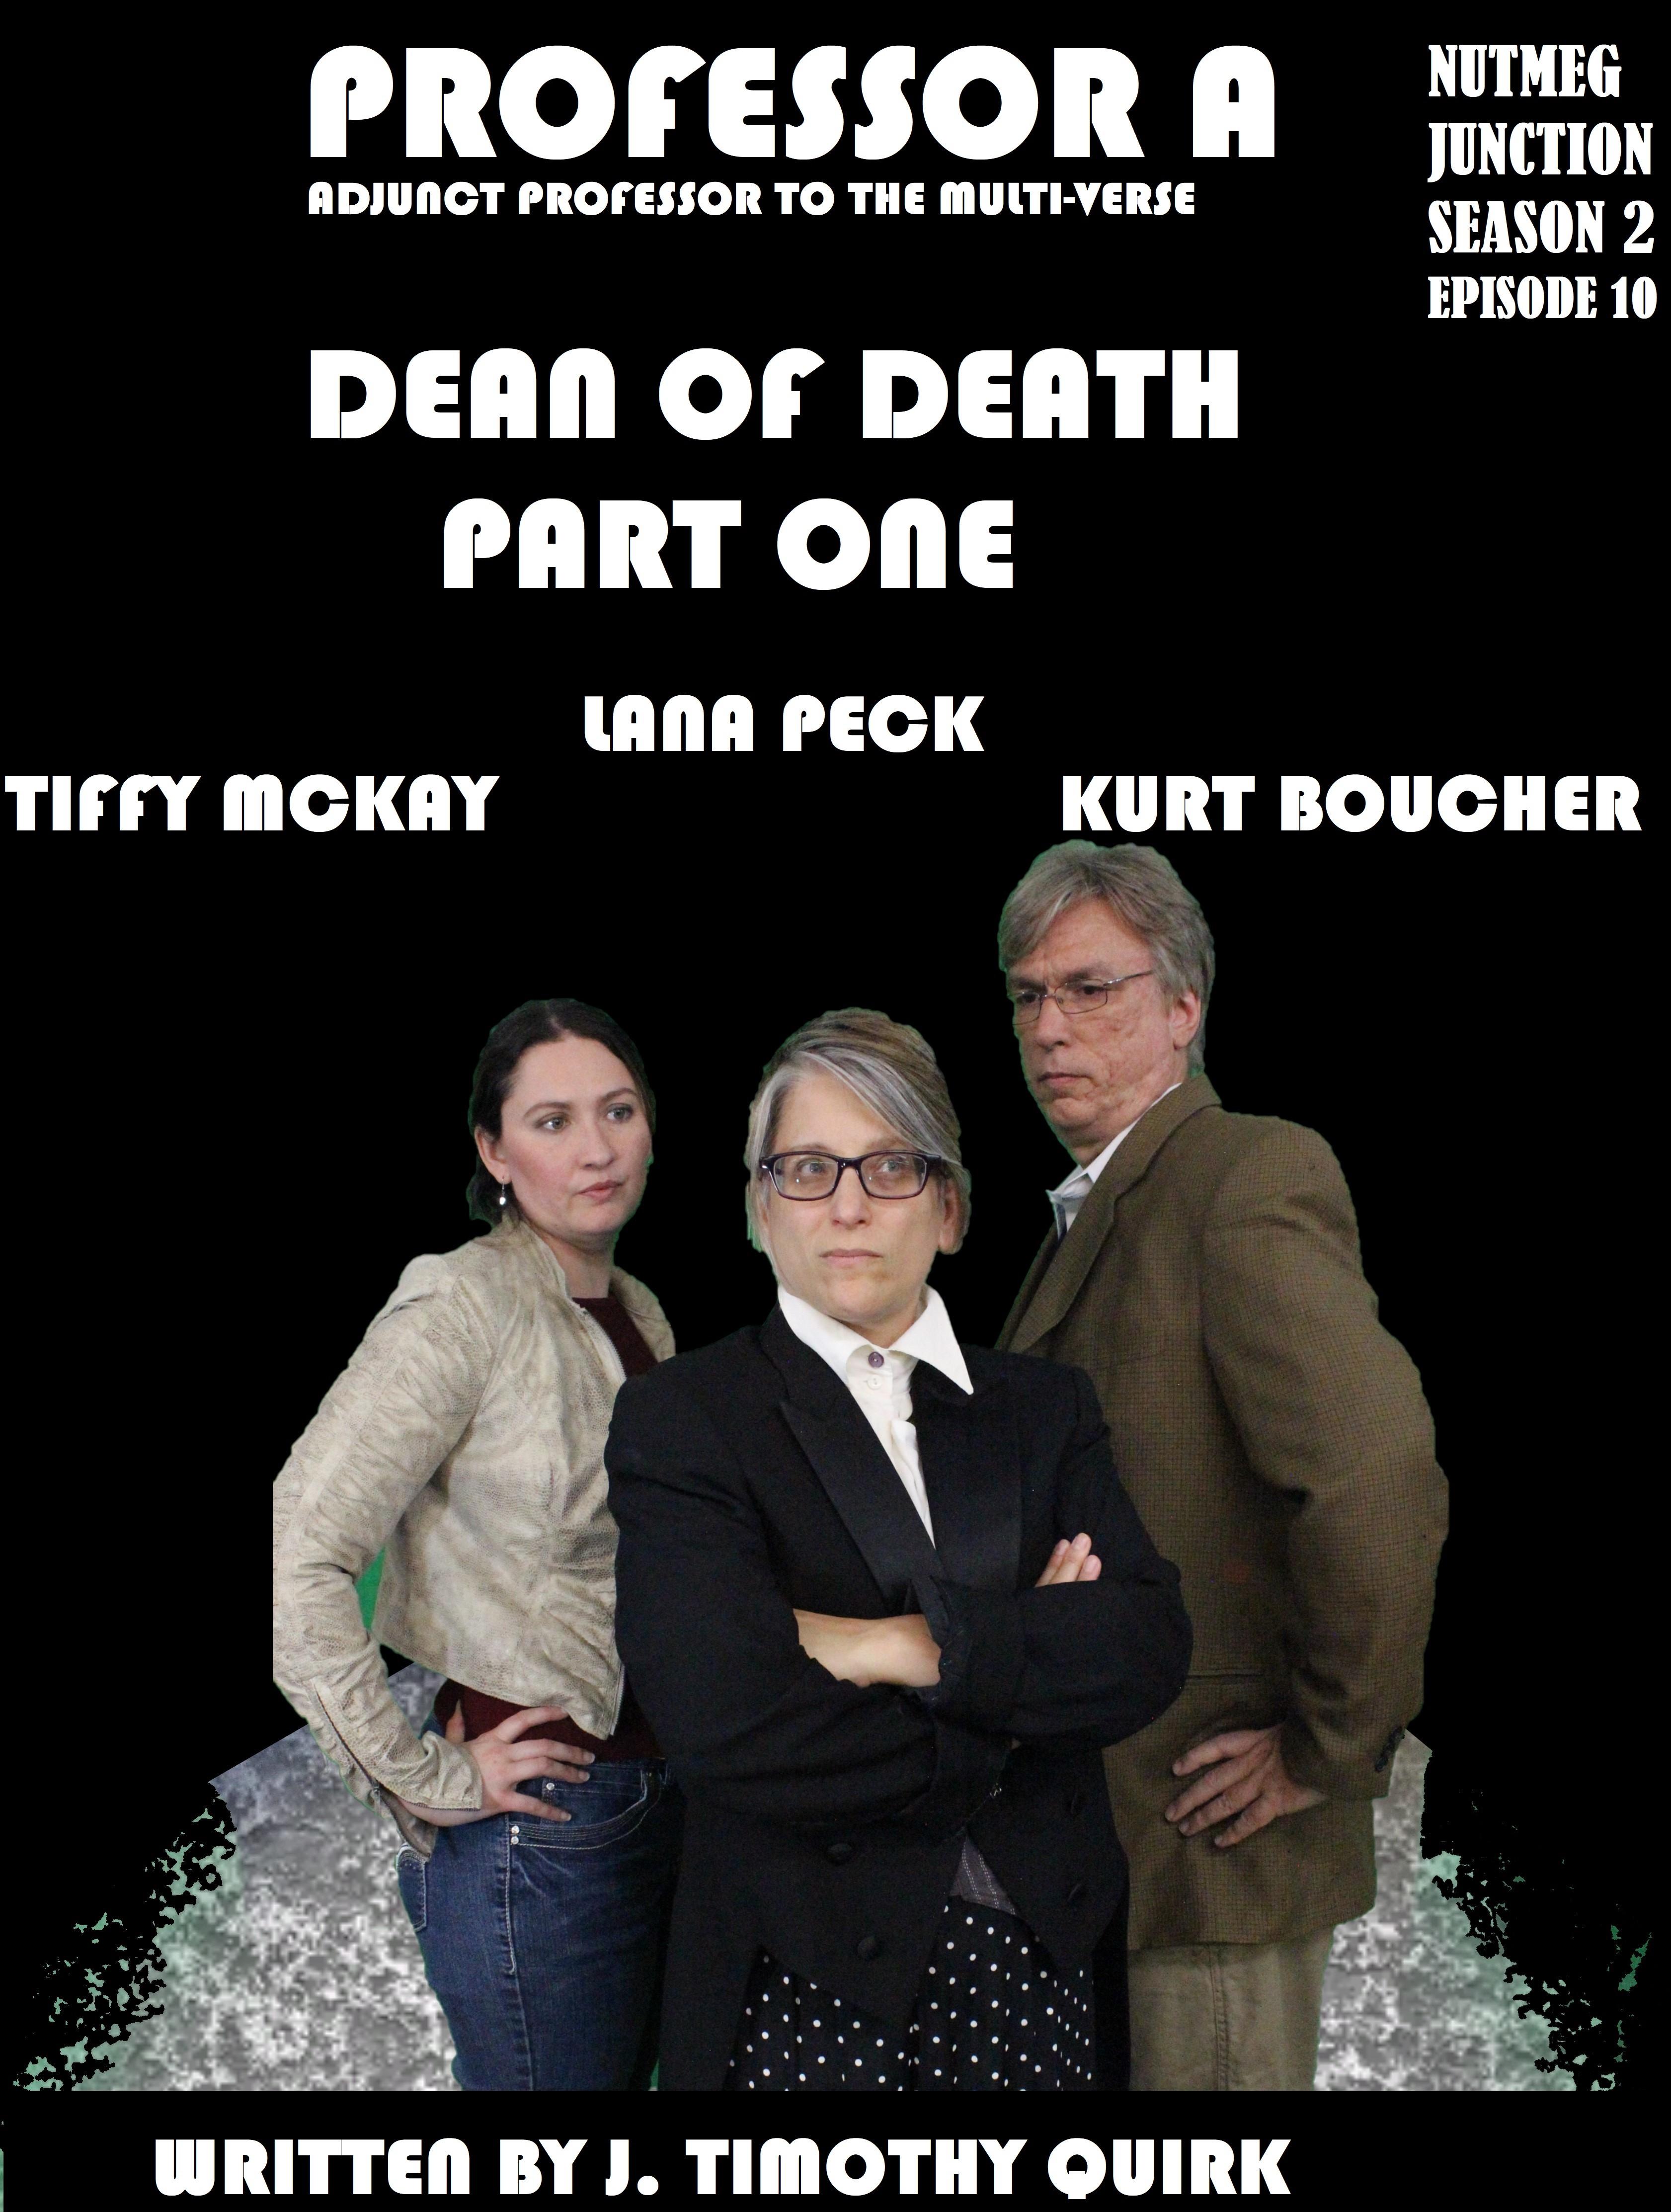 PROF DEAN OF DEATH1 (2)